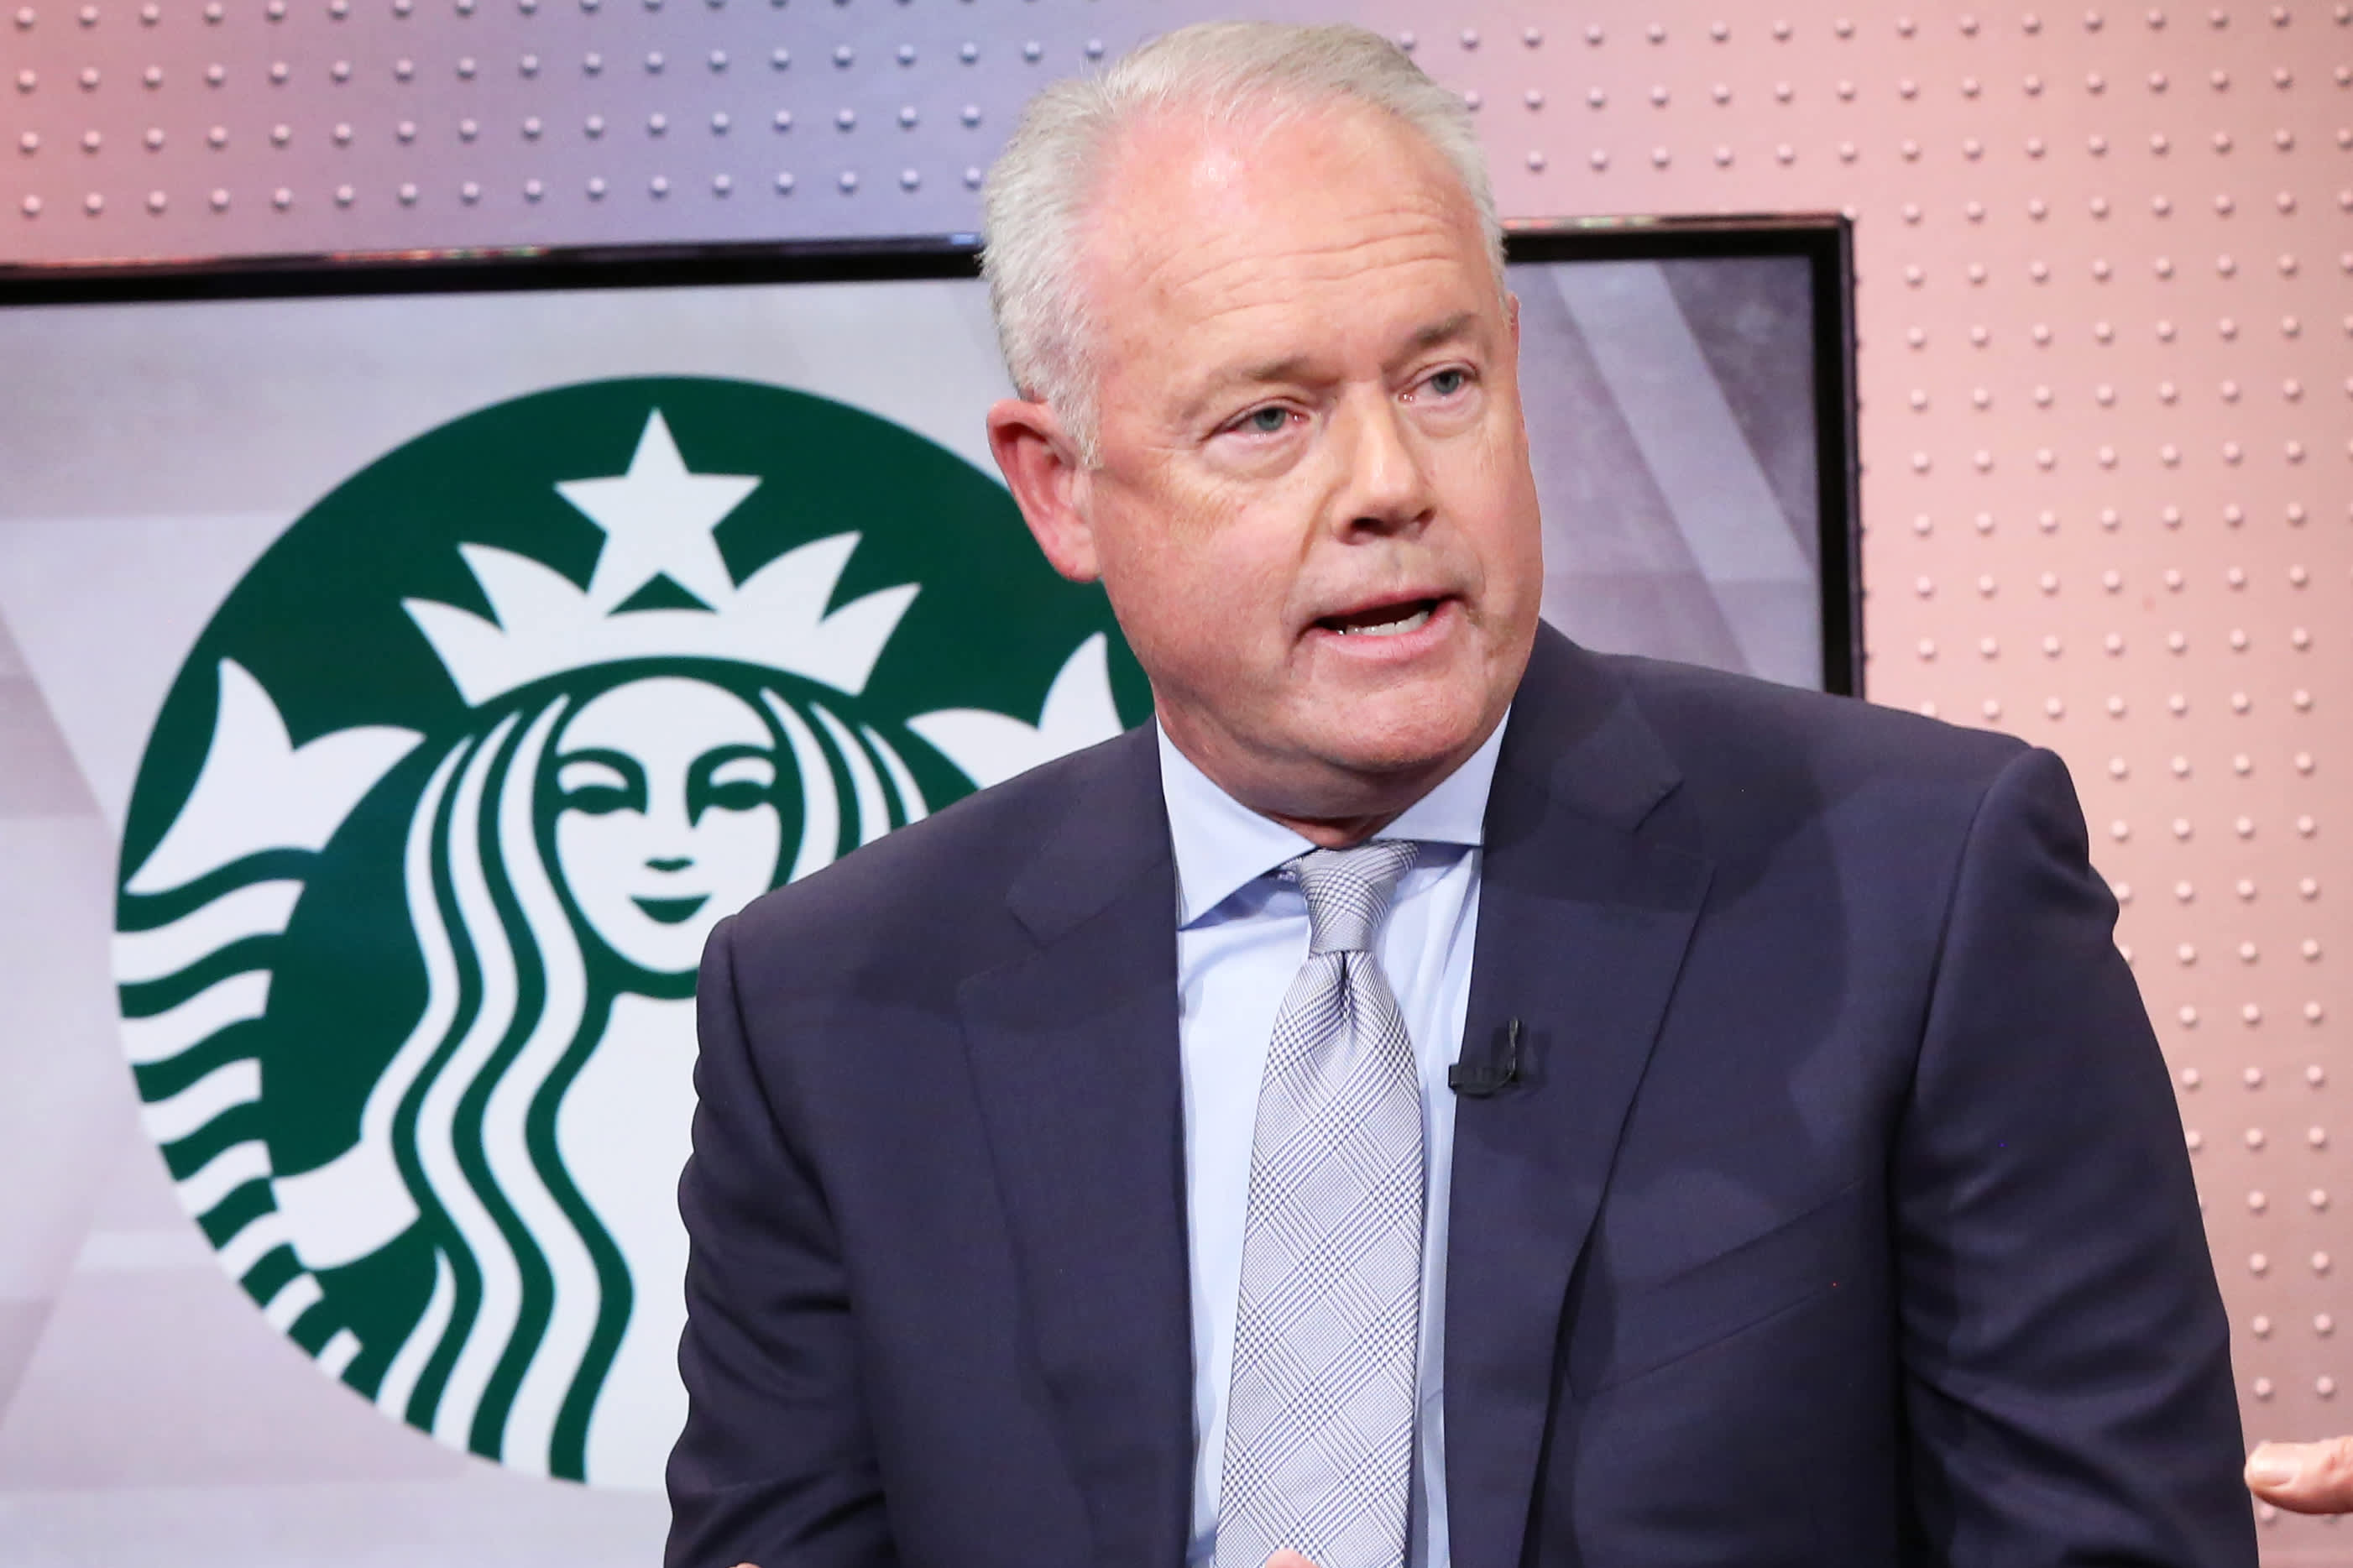 'We've got a strong balance sheet': Starbucks CEO defends buybacks